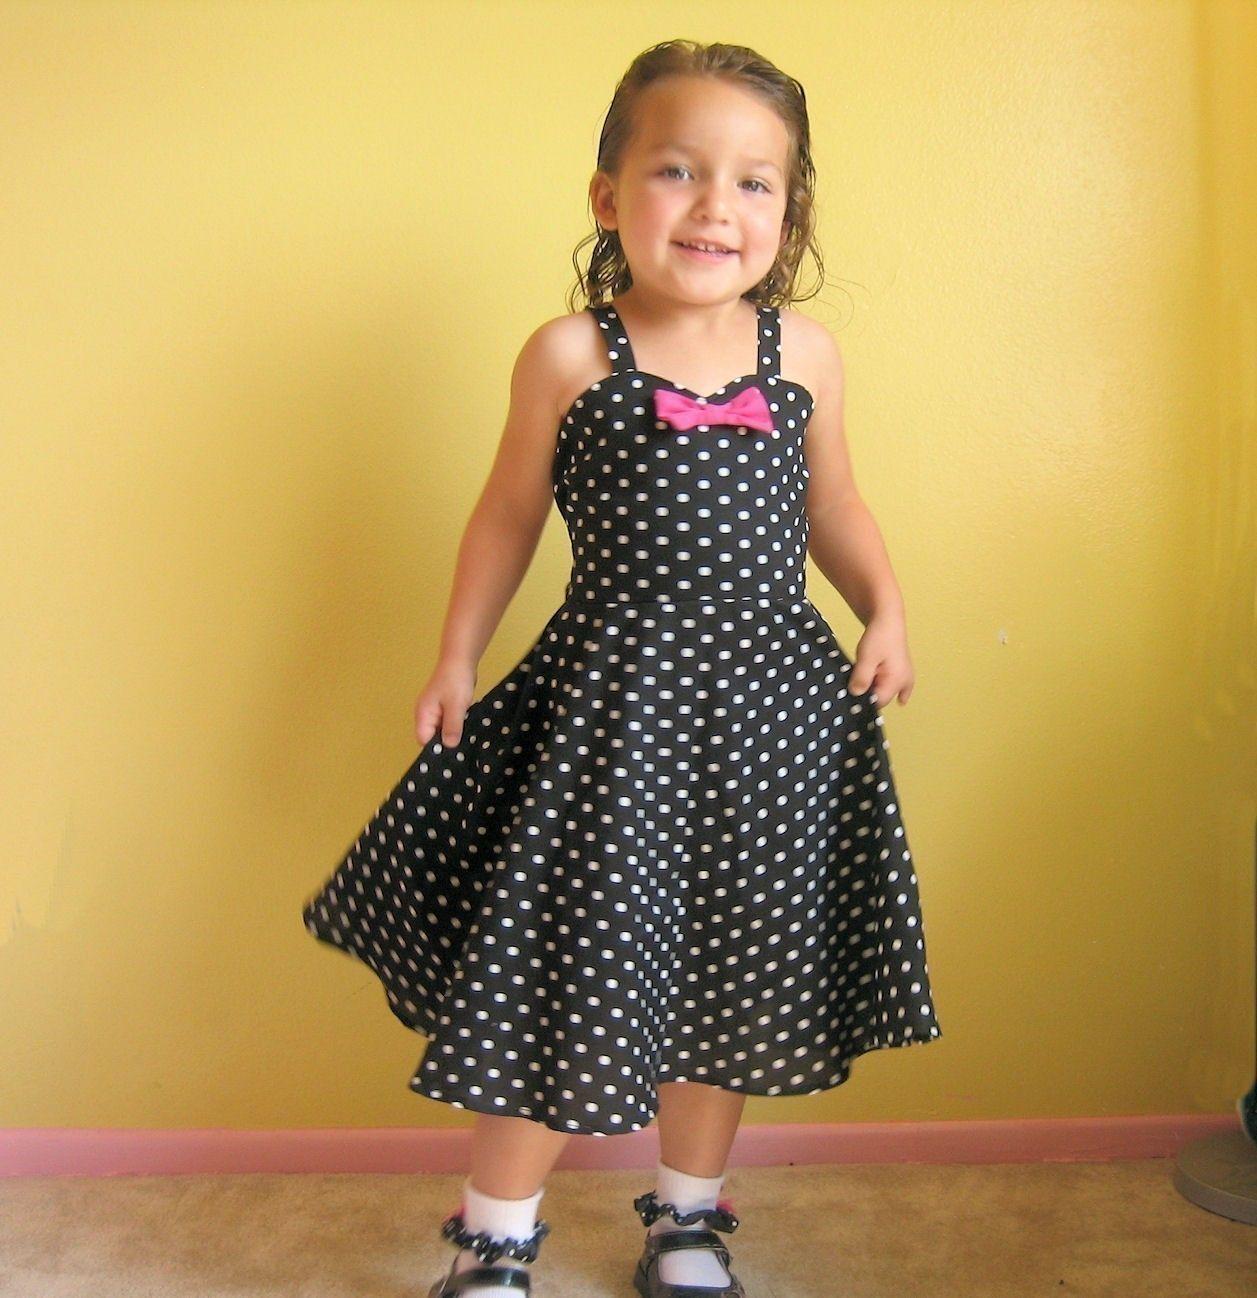 Retro black polka dot twirly circle skirt swing dance dress hot pink